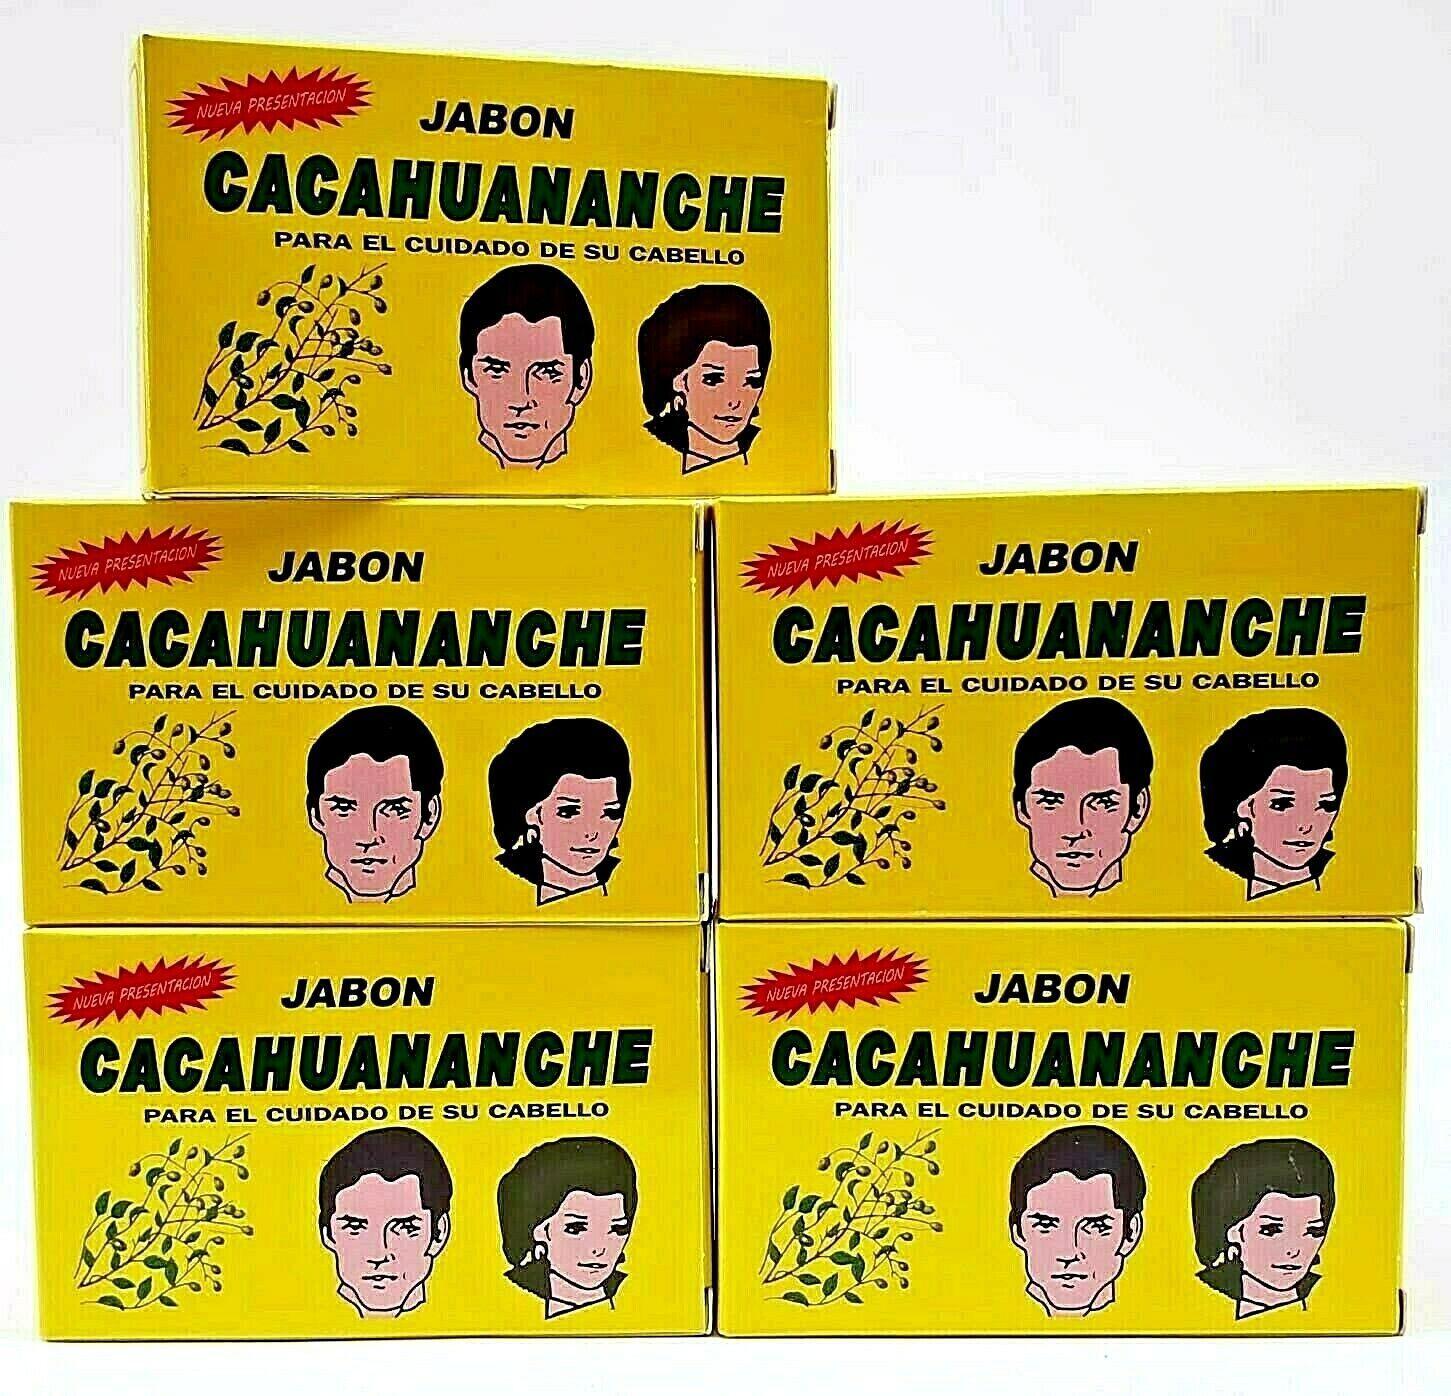 5 Packs Jabon Cacahuananche Cacahuananche Soap 3.17oz Oscurece Canas